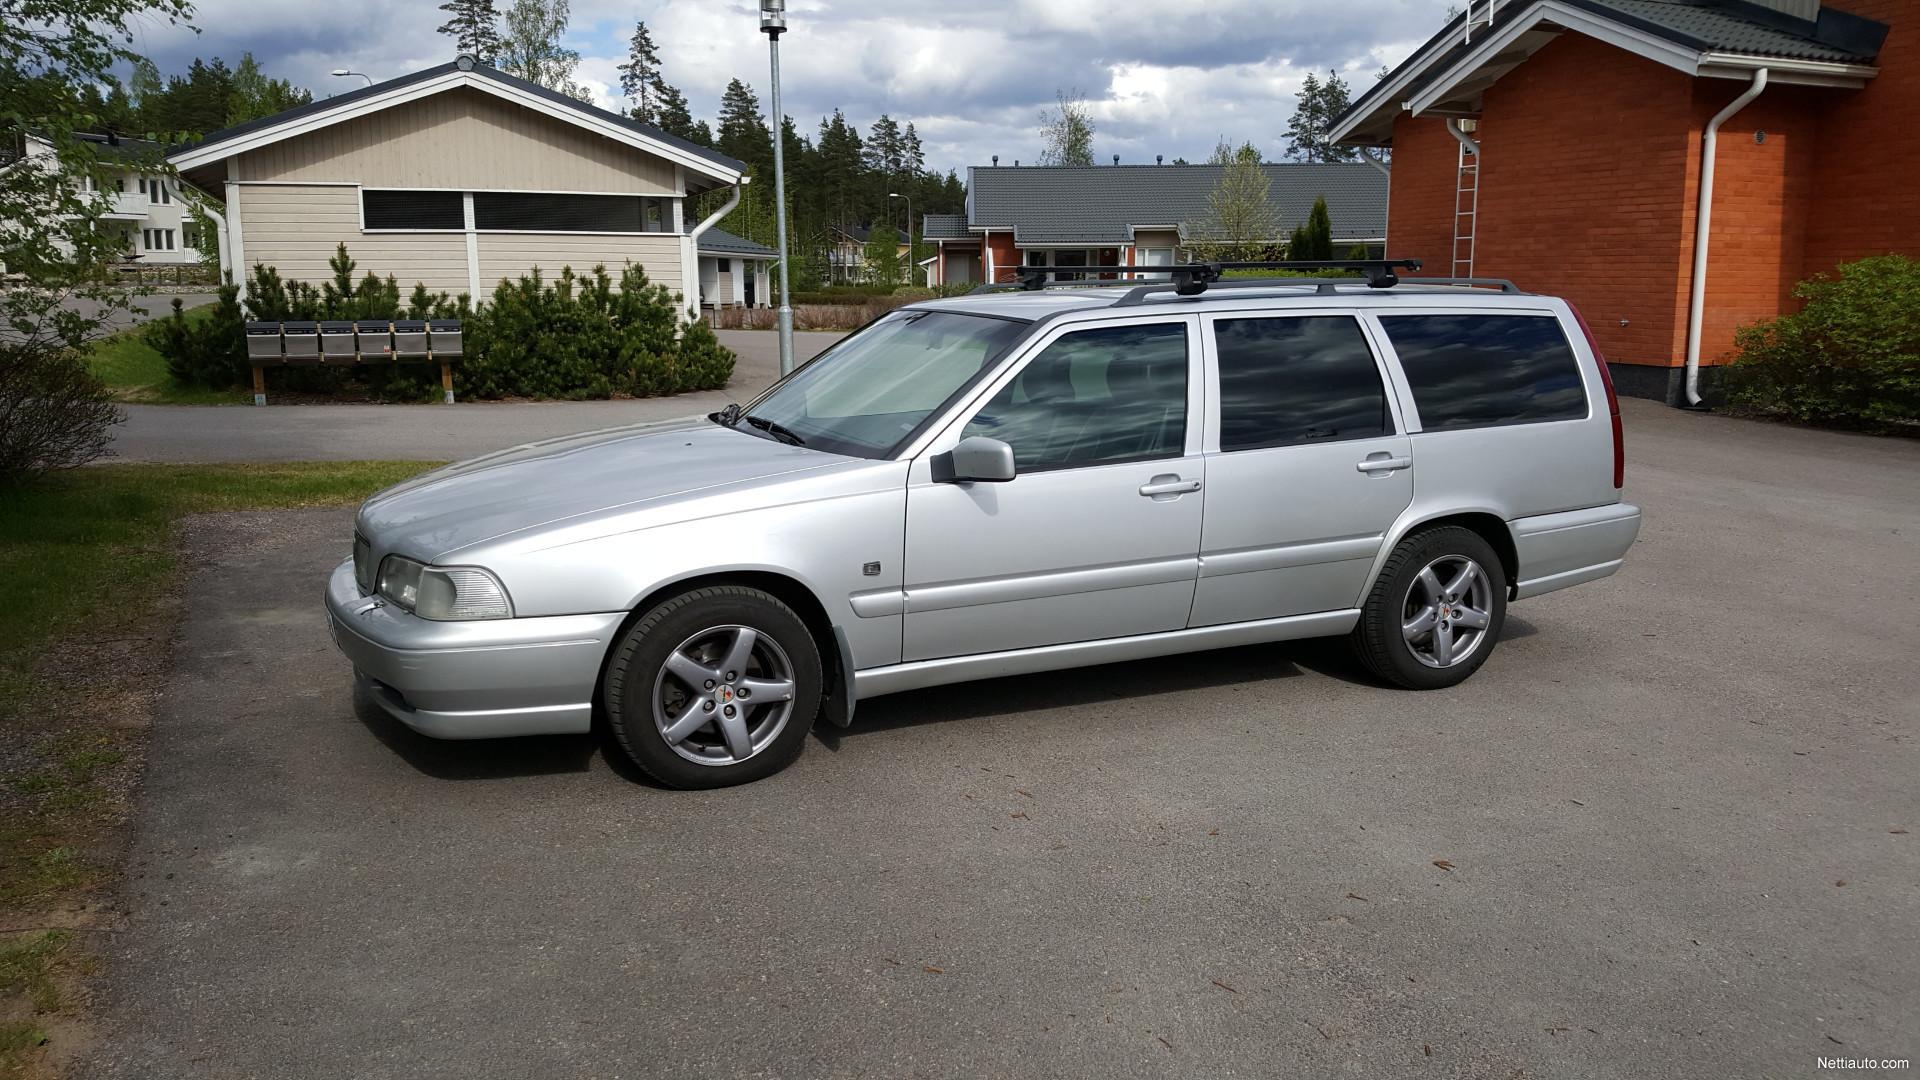 Volvo V Ec C D Ecba Large on Volvo Immobilizer Location